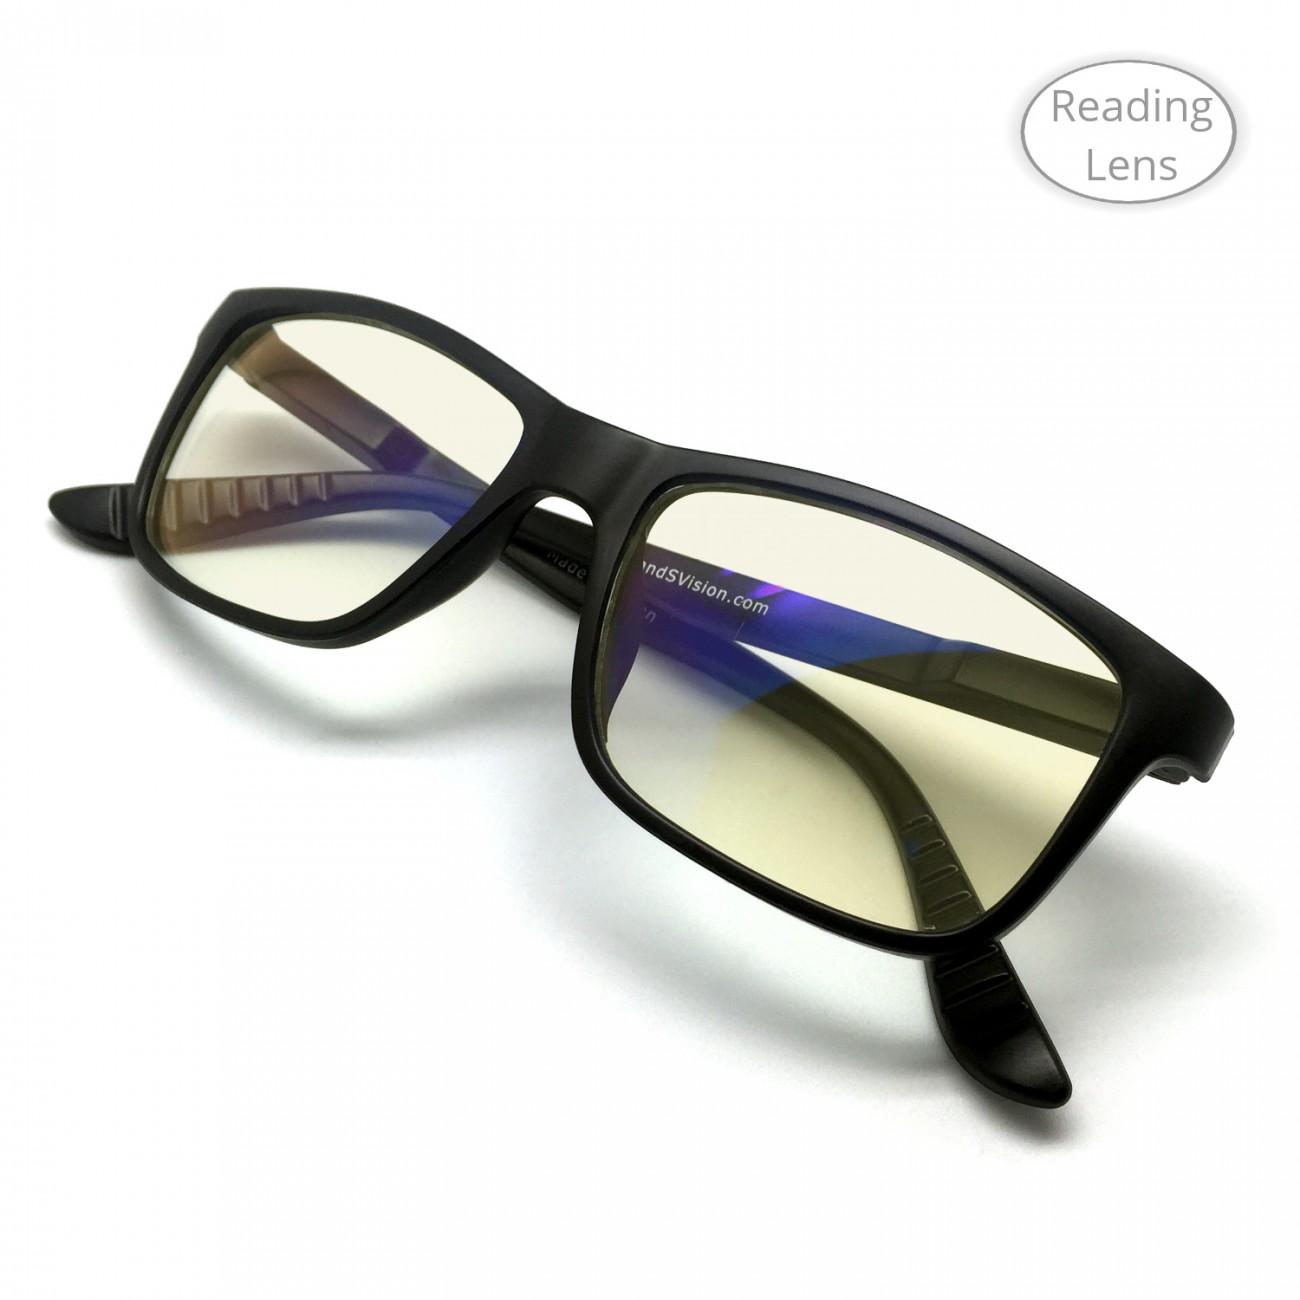 J+S Vision Blue Light Shield Computer/iPad Reading Glasses